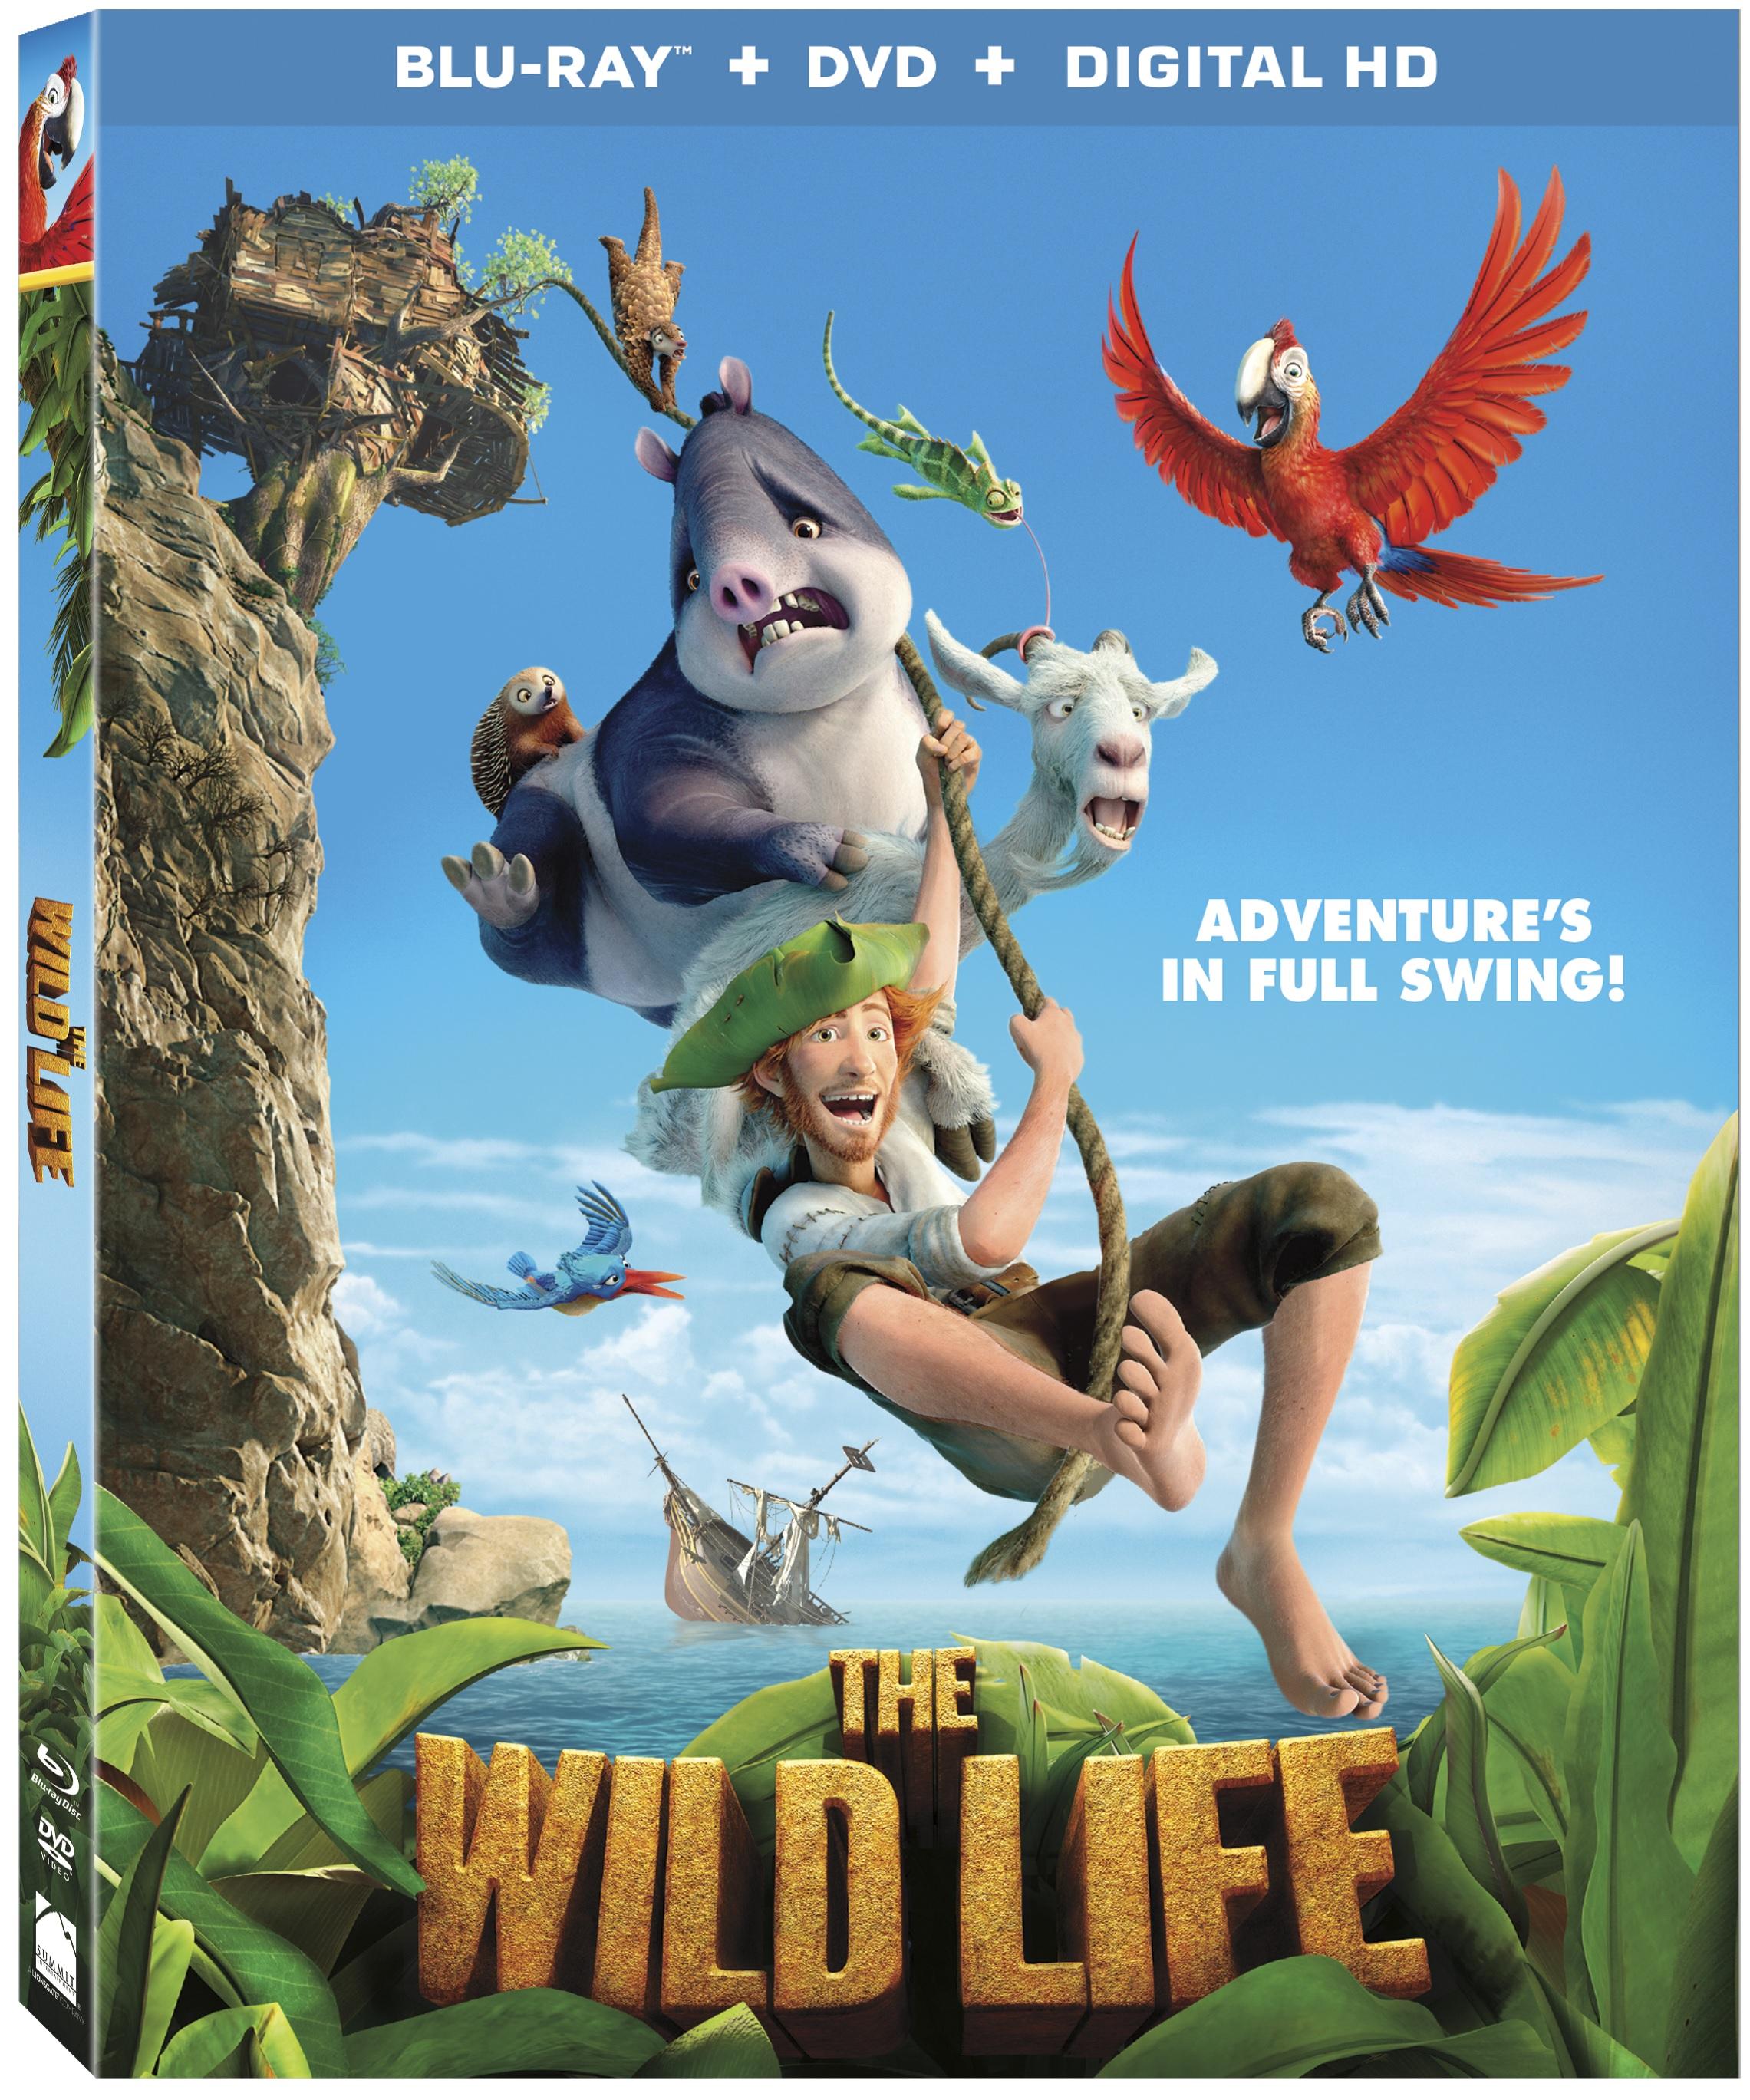 THE WILD LIFE Blu-ray